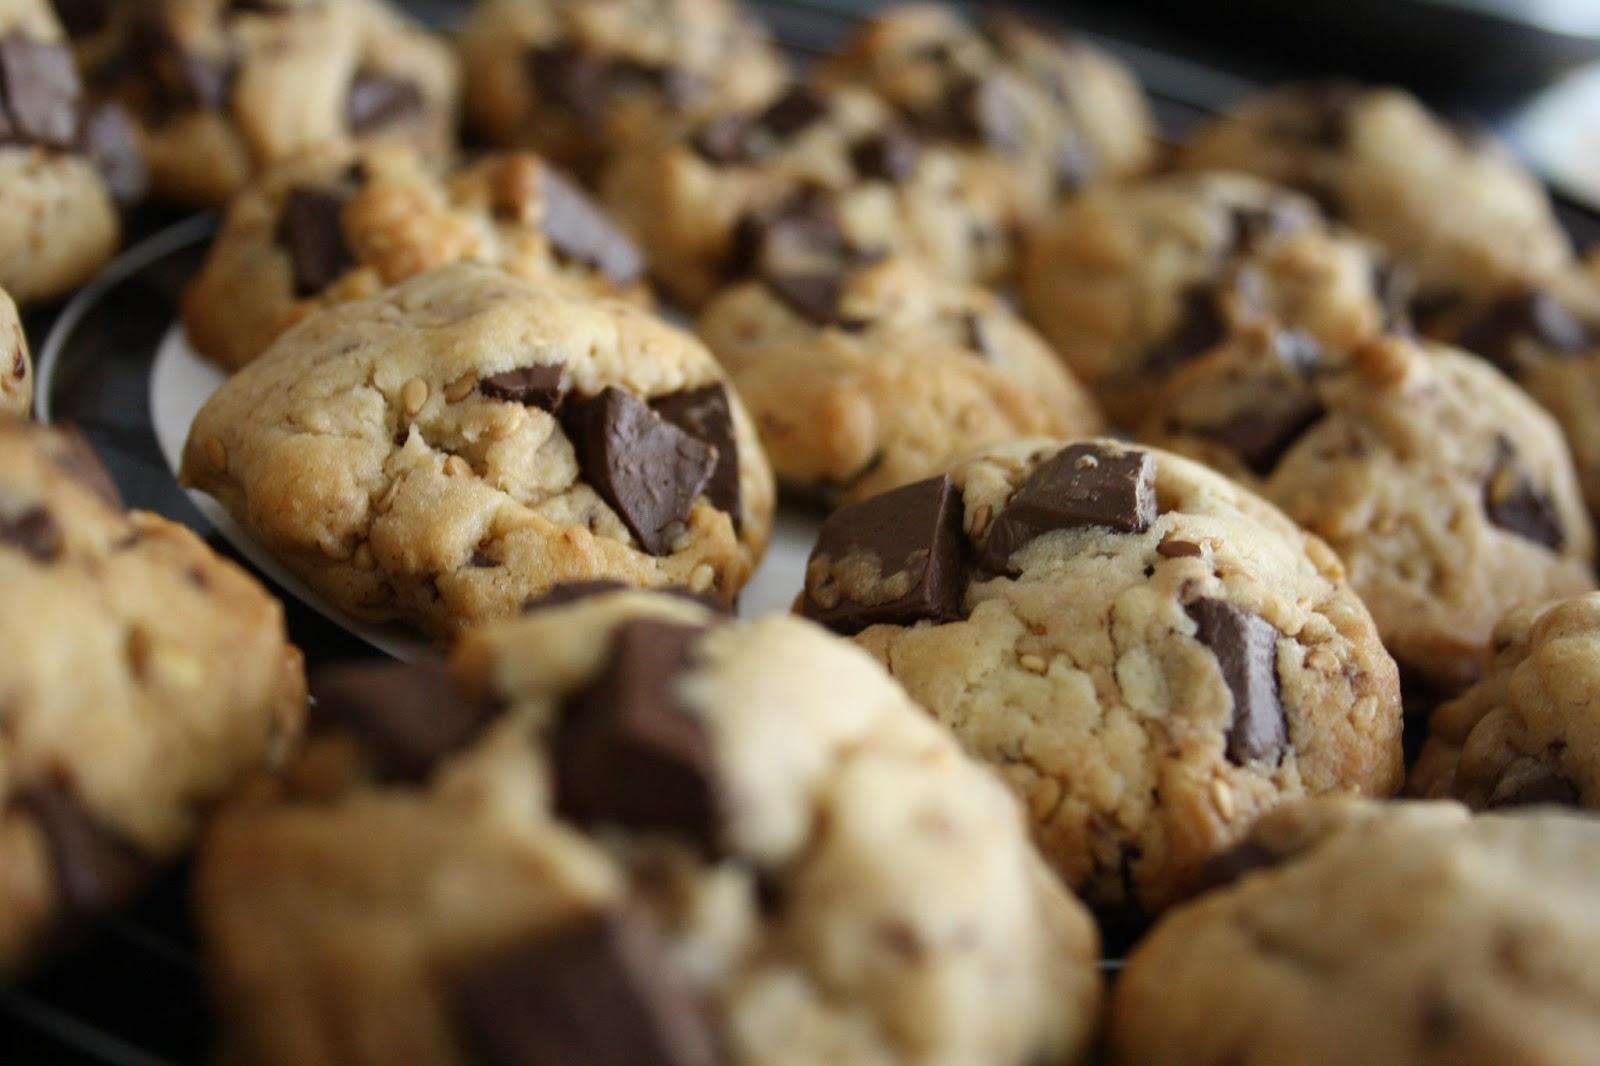 Recette cookies chocolat sésame gourmand et facile